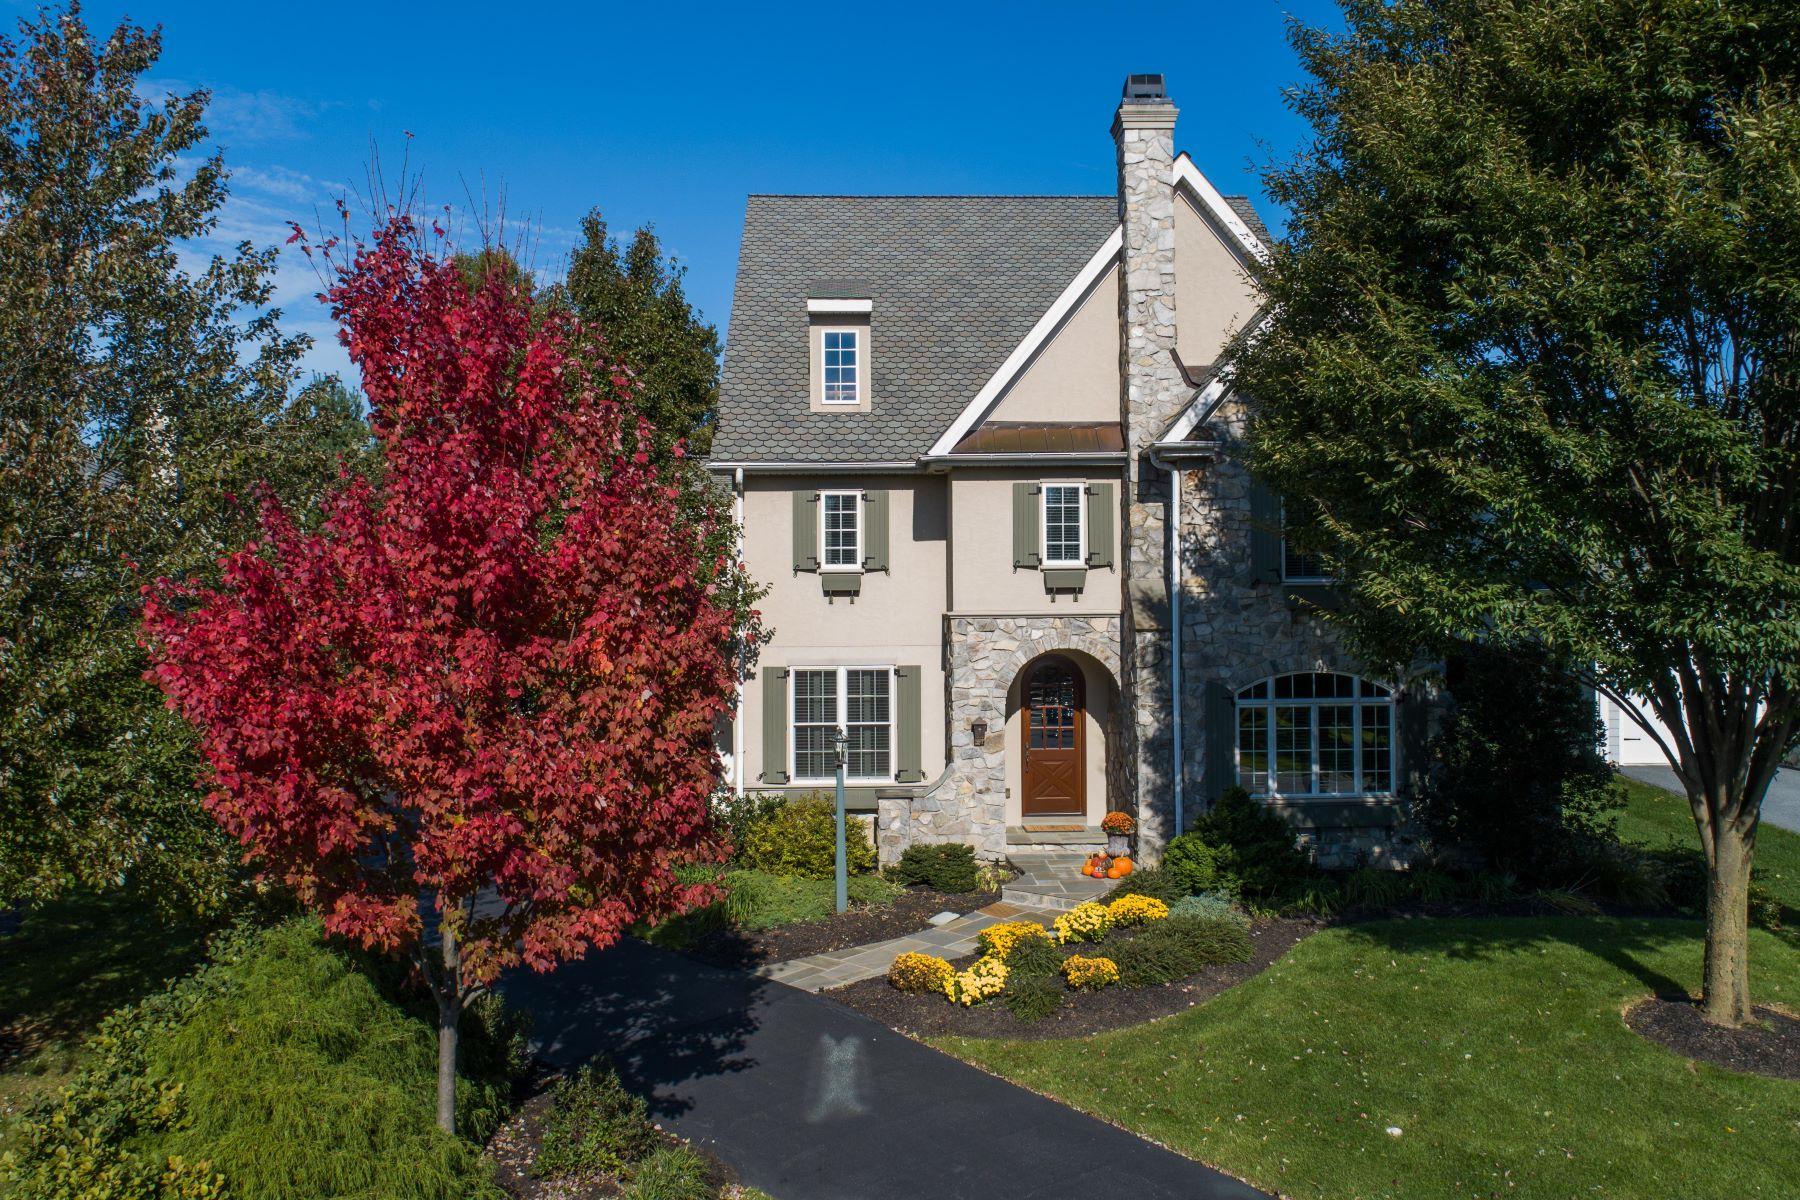 Casa Unifamiliar por un Venta en 659 Goose Neck Drive 659 Goose Neck Drive Lititz, Pennsylvania 17543 Estados Unidos